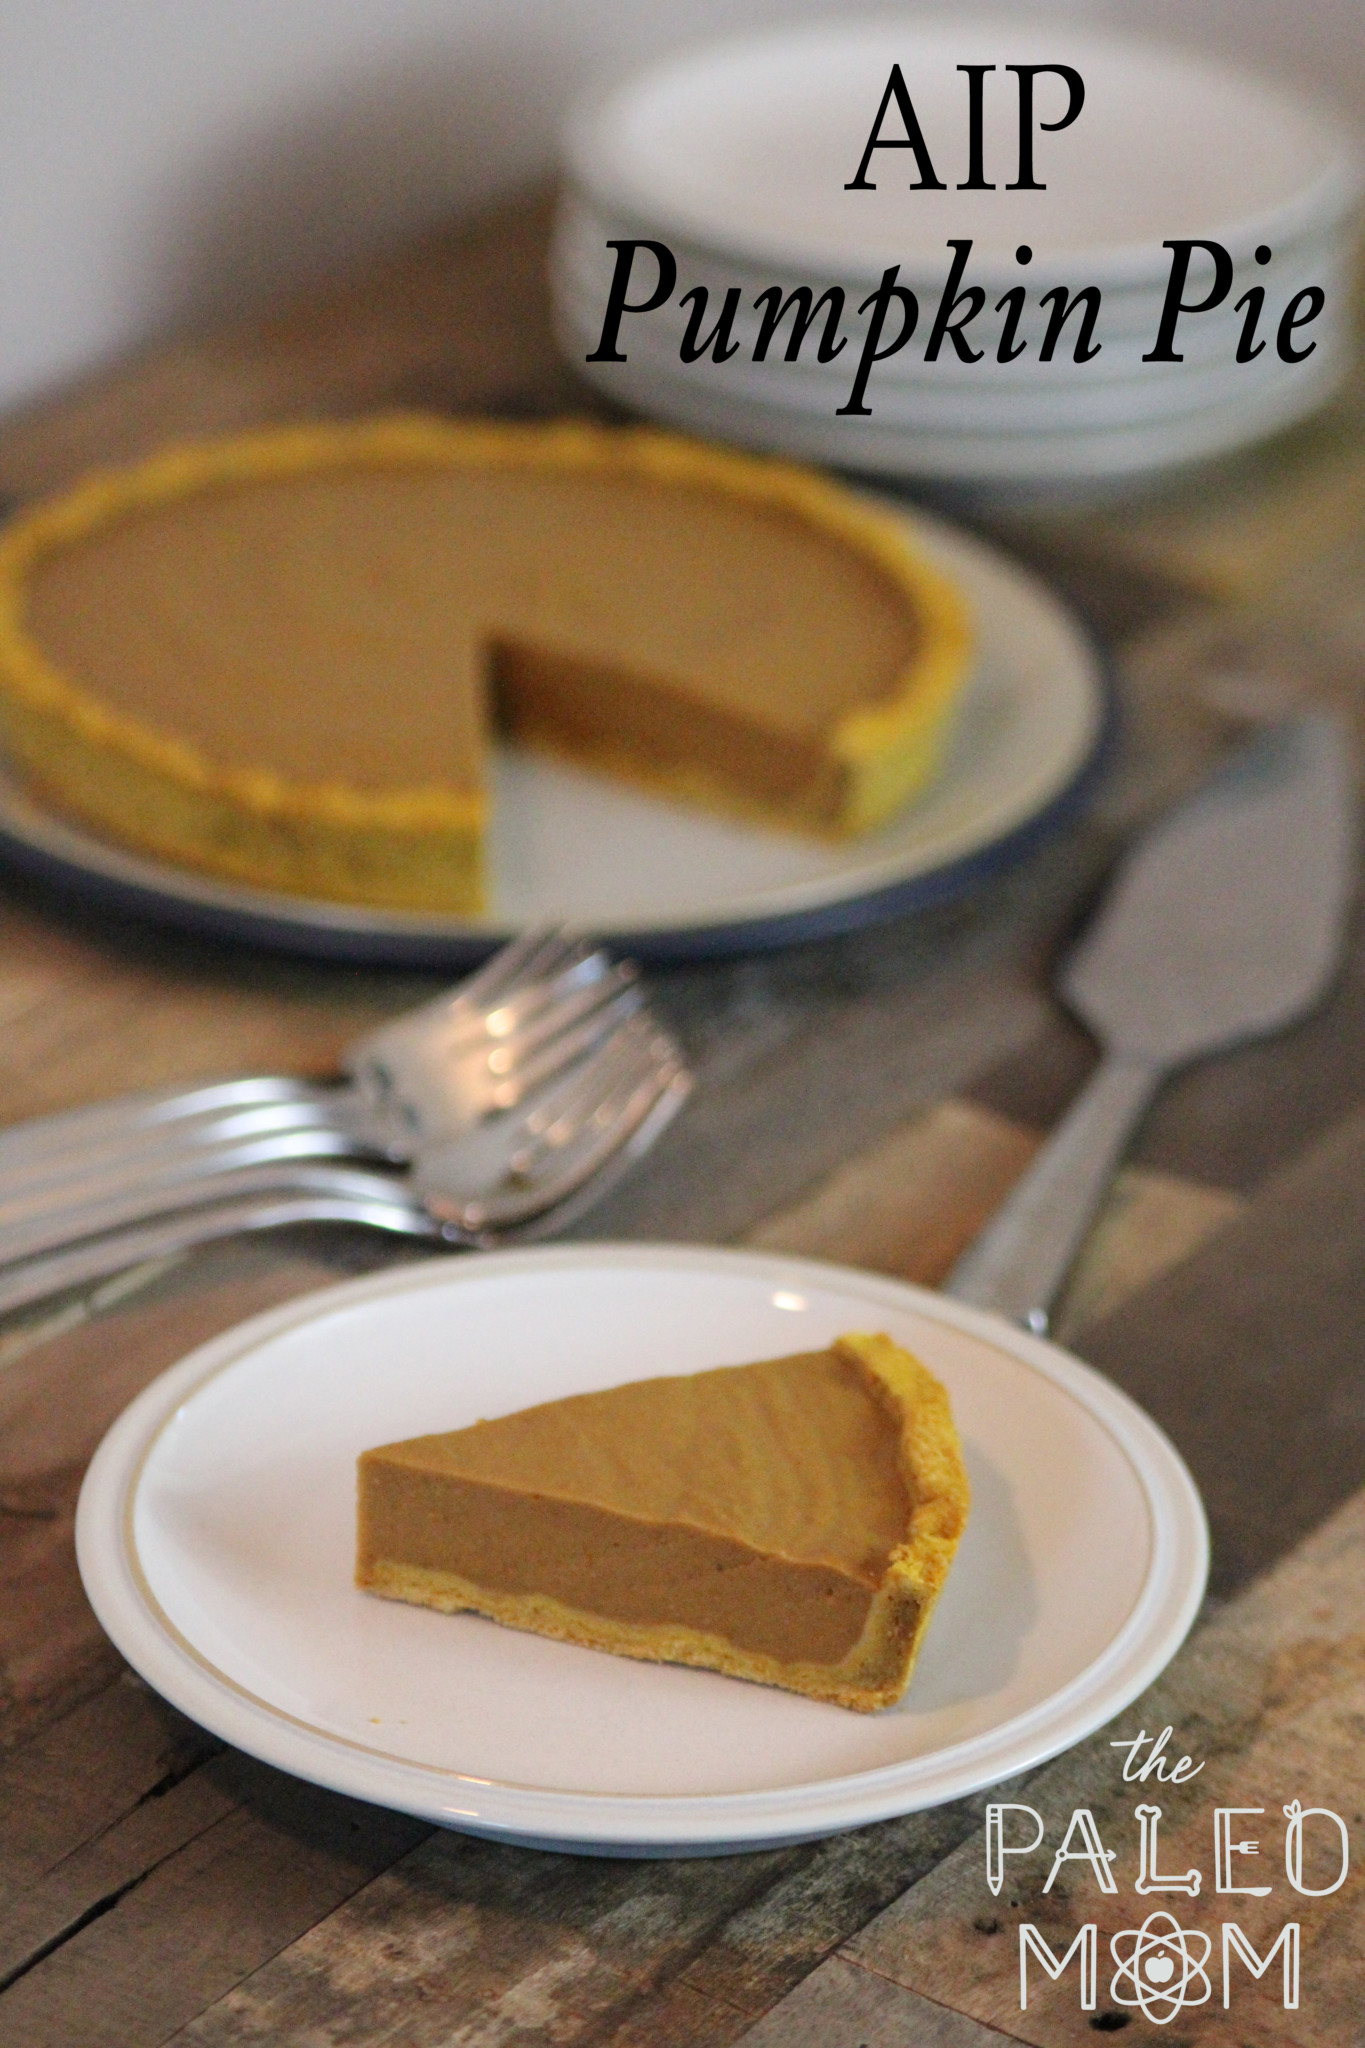 aip-pumpkin-pie